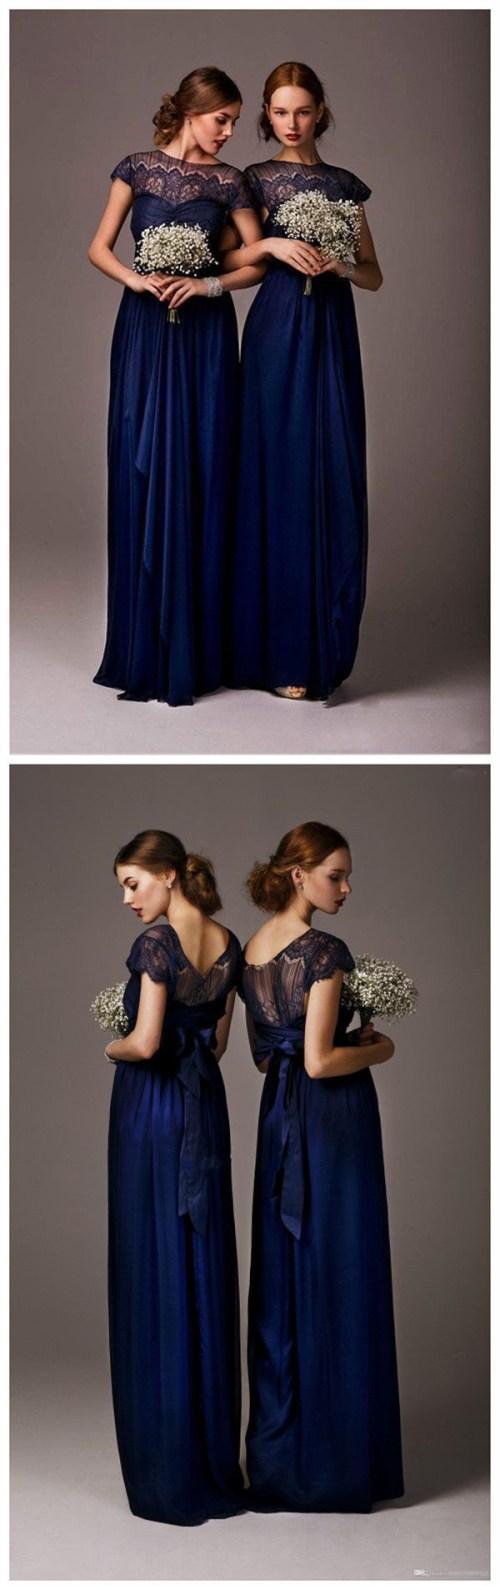 Medium Of Navy Bridesmaid Dresses